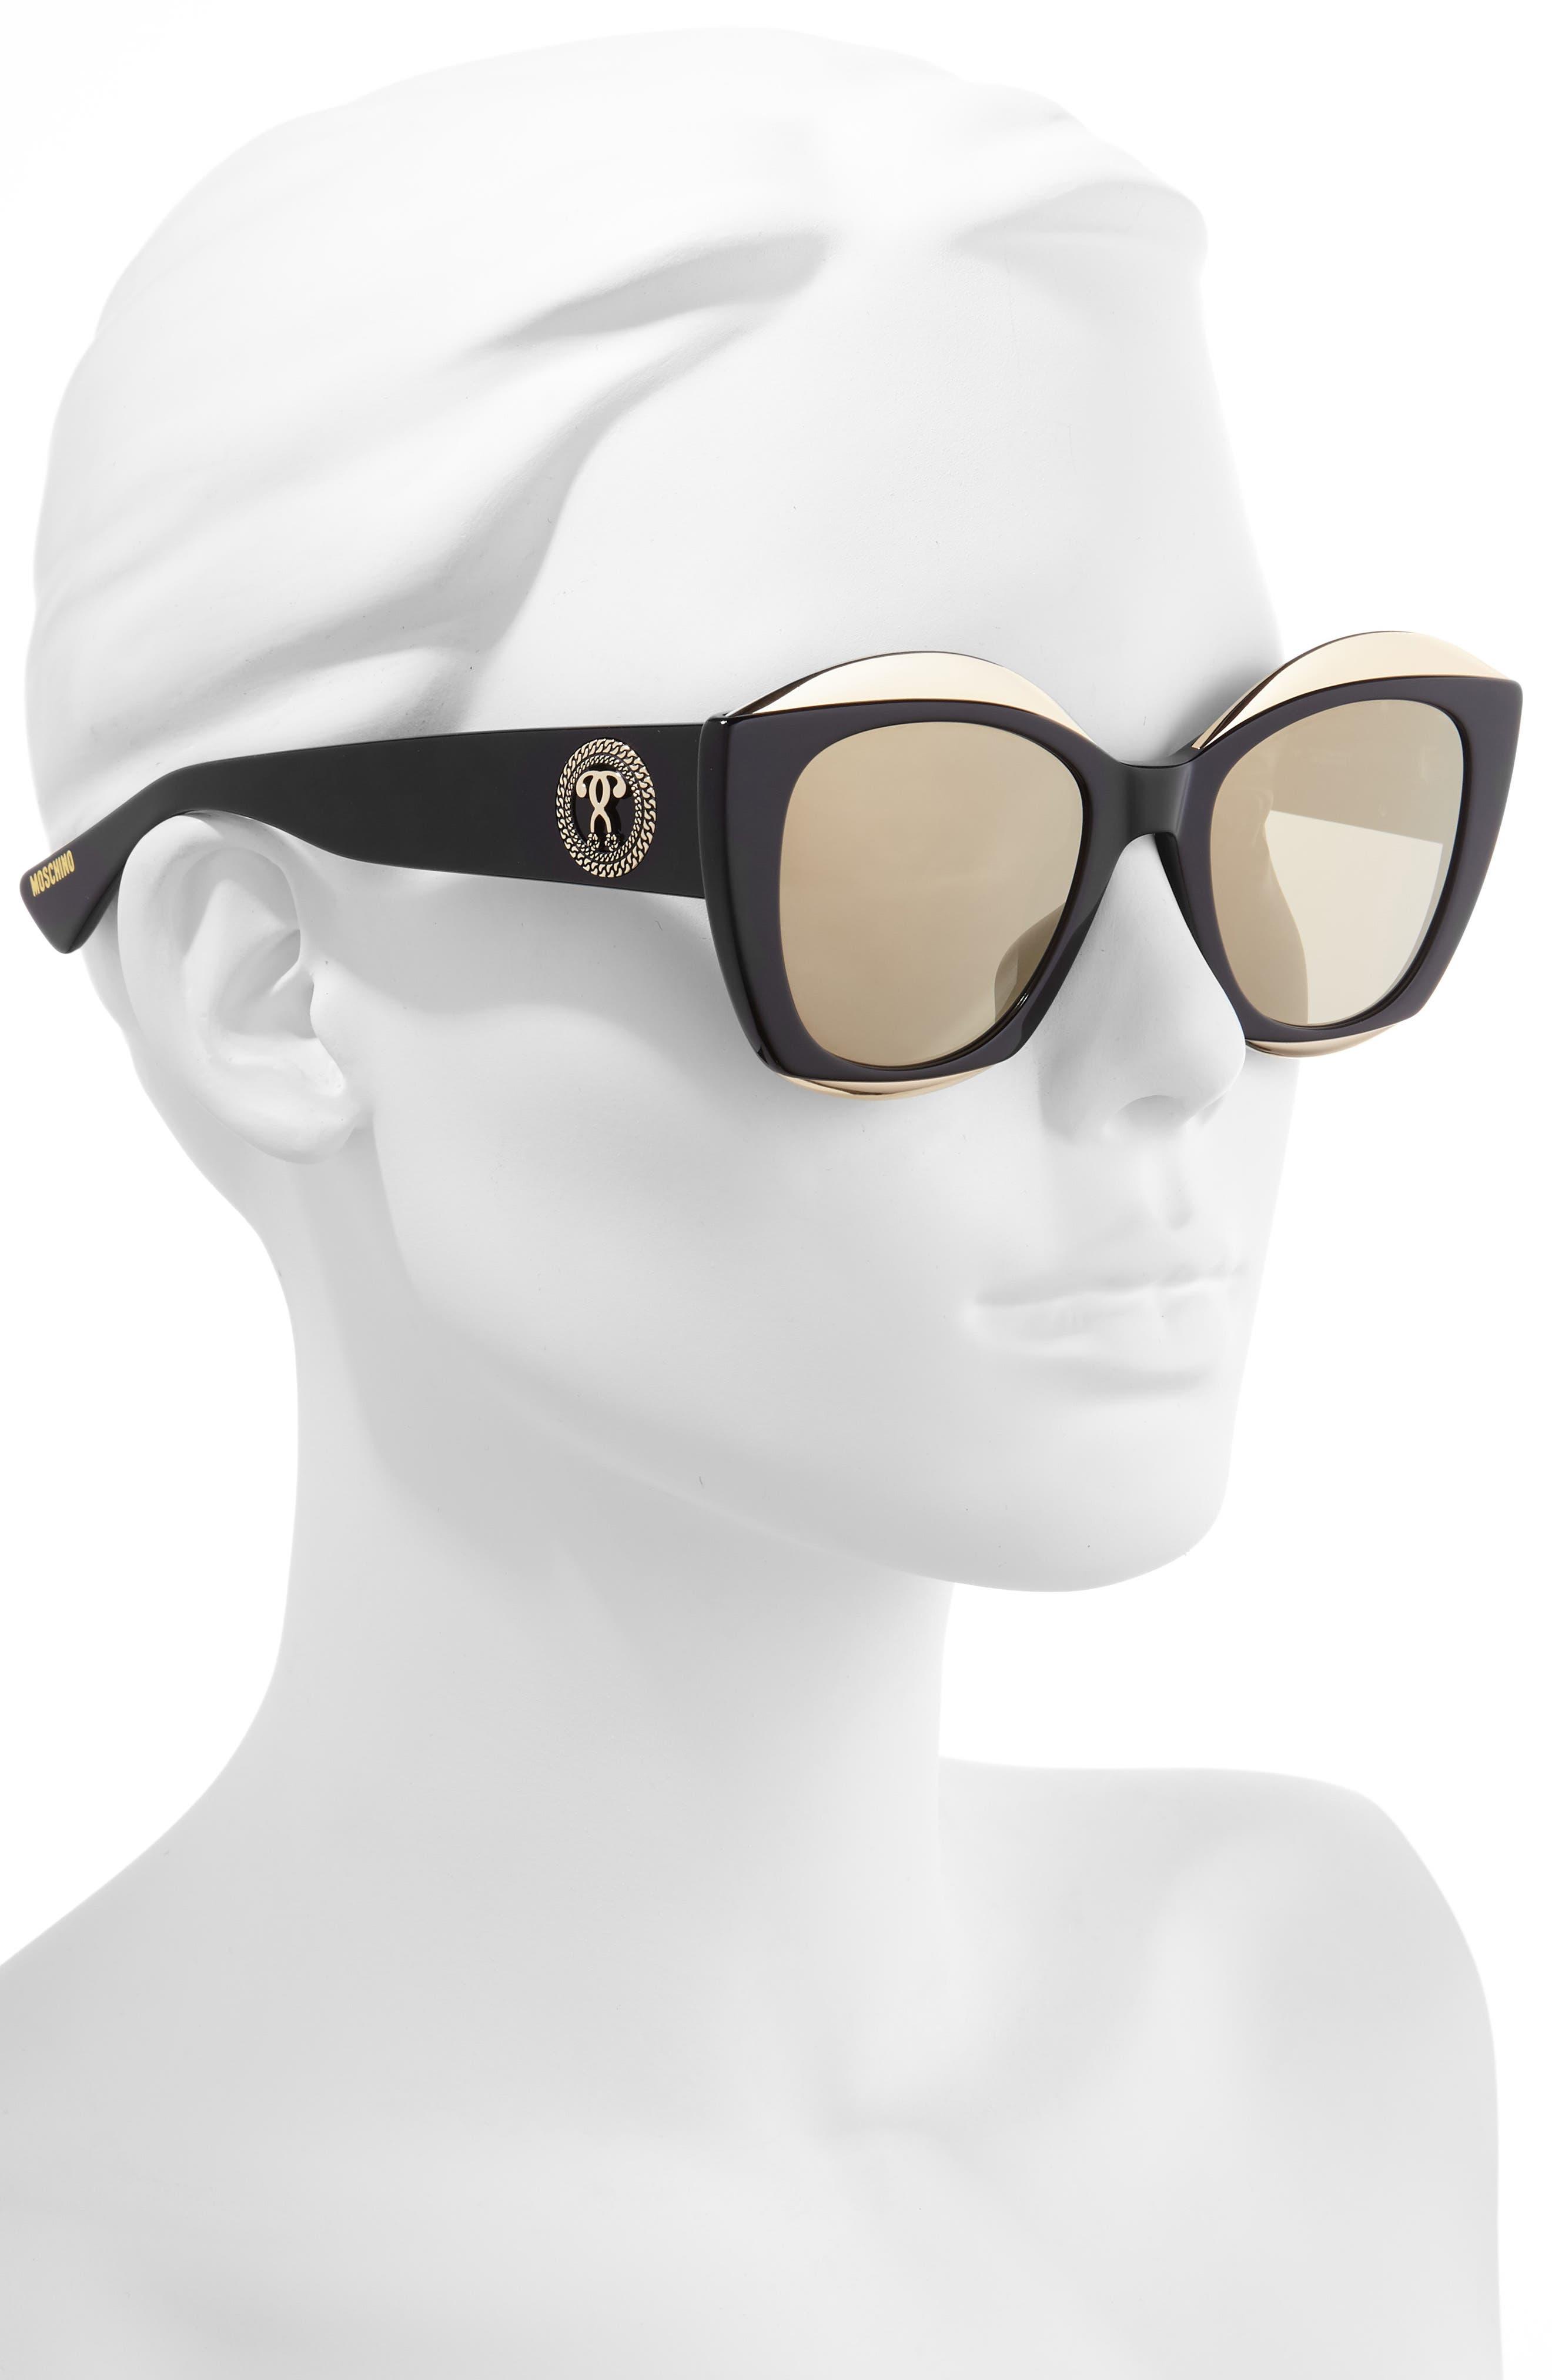 MOSCHINO, 52mm Cat Eye Sunglasses, Alternate thumbnail 2, color, BLACK